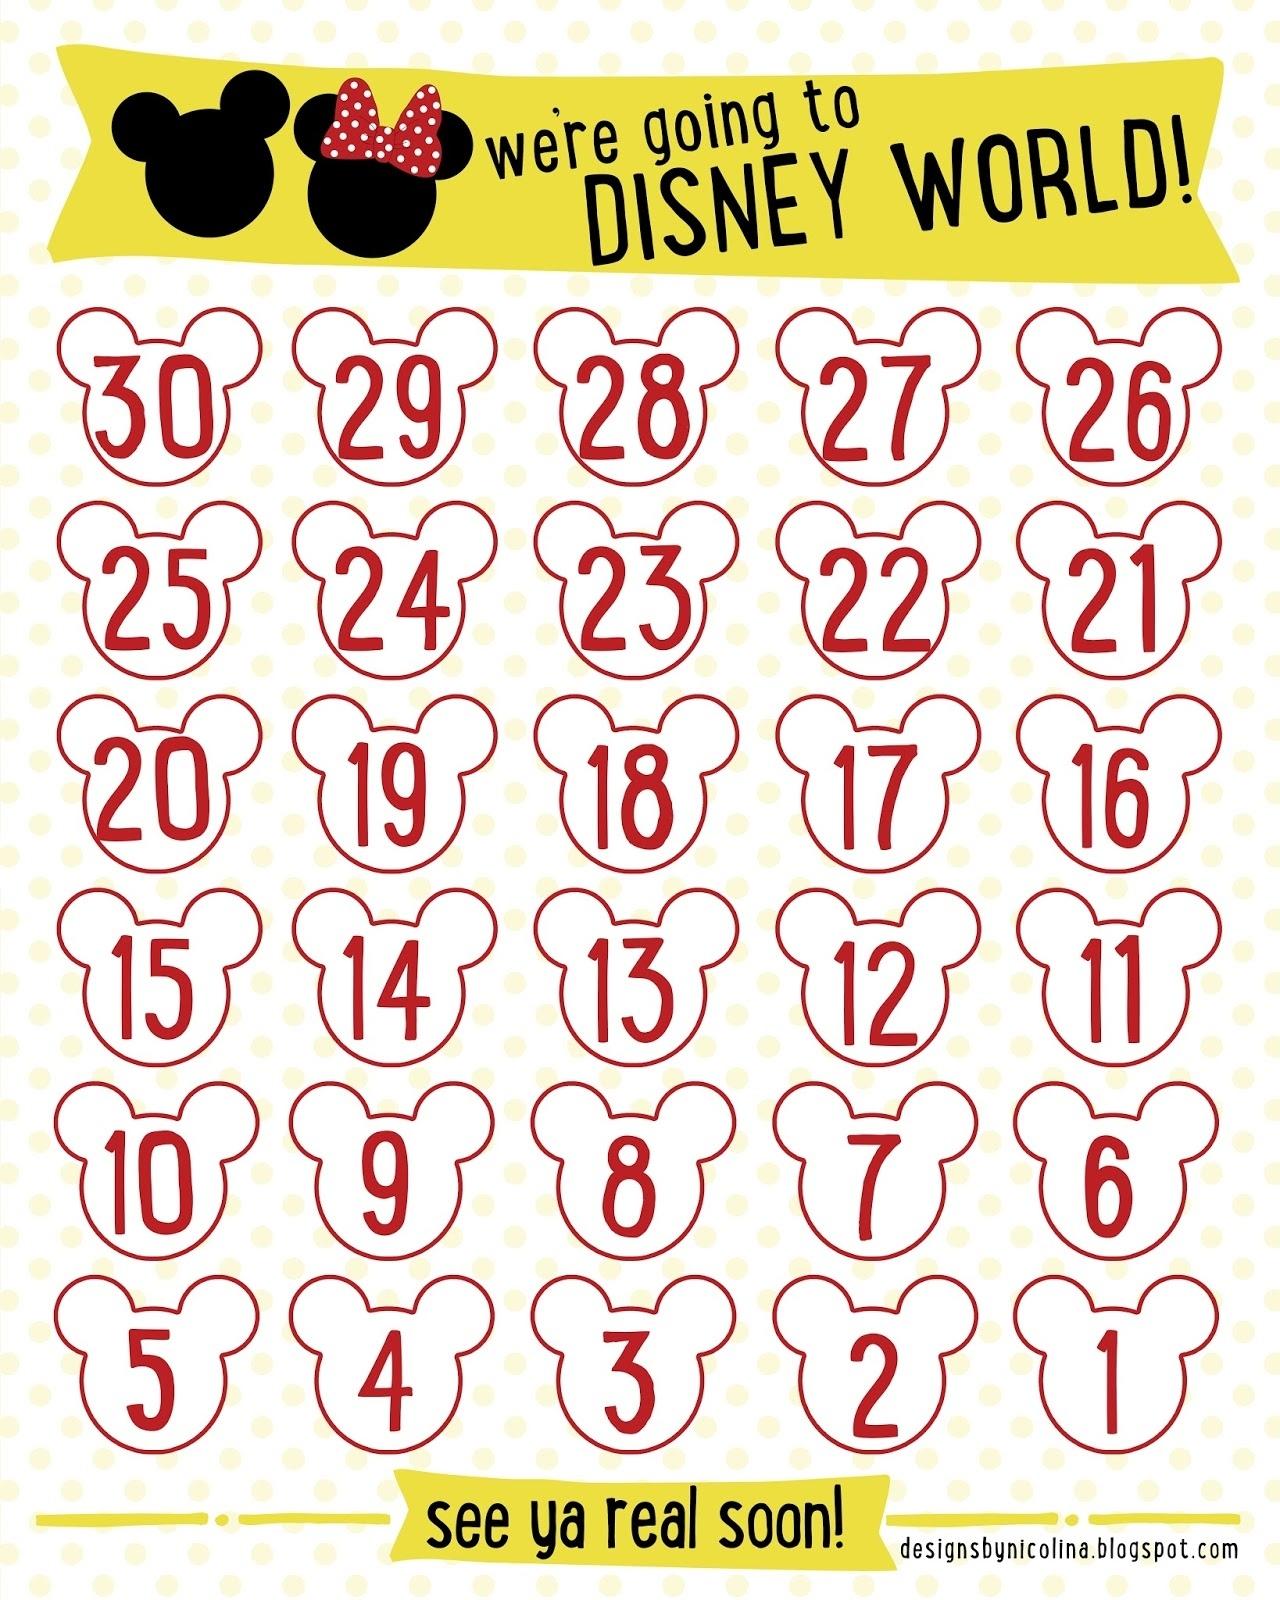 Designs By Nicolina: Disney Countdown! /// Free Printable /// Printable Count Down To Disney